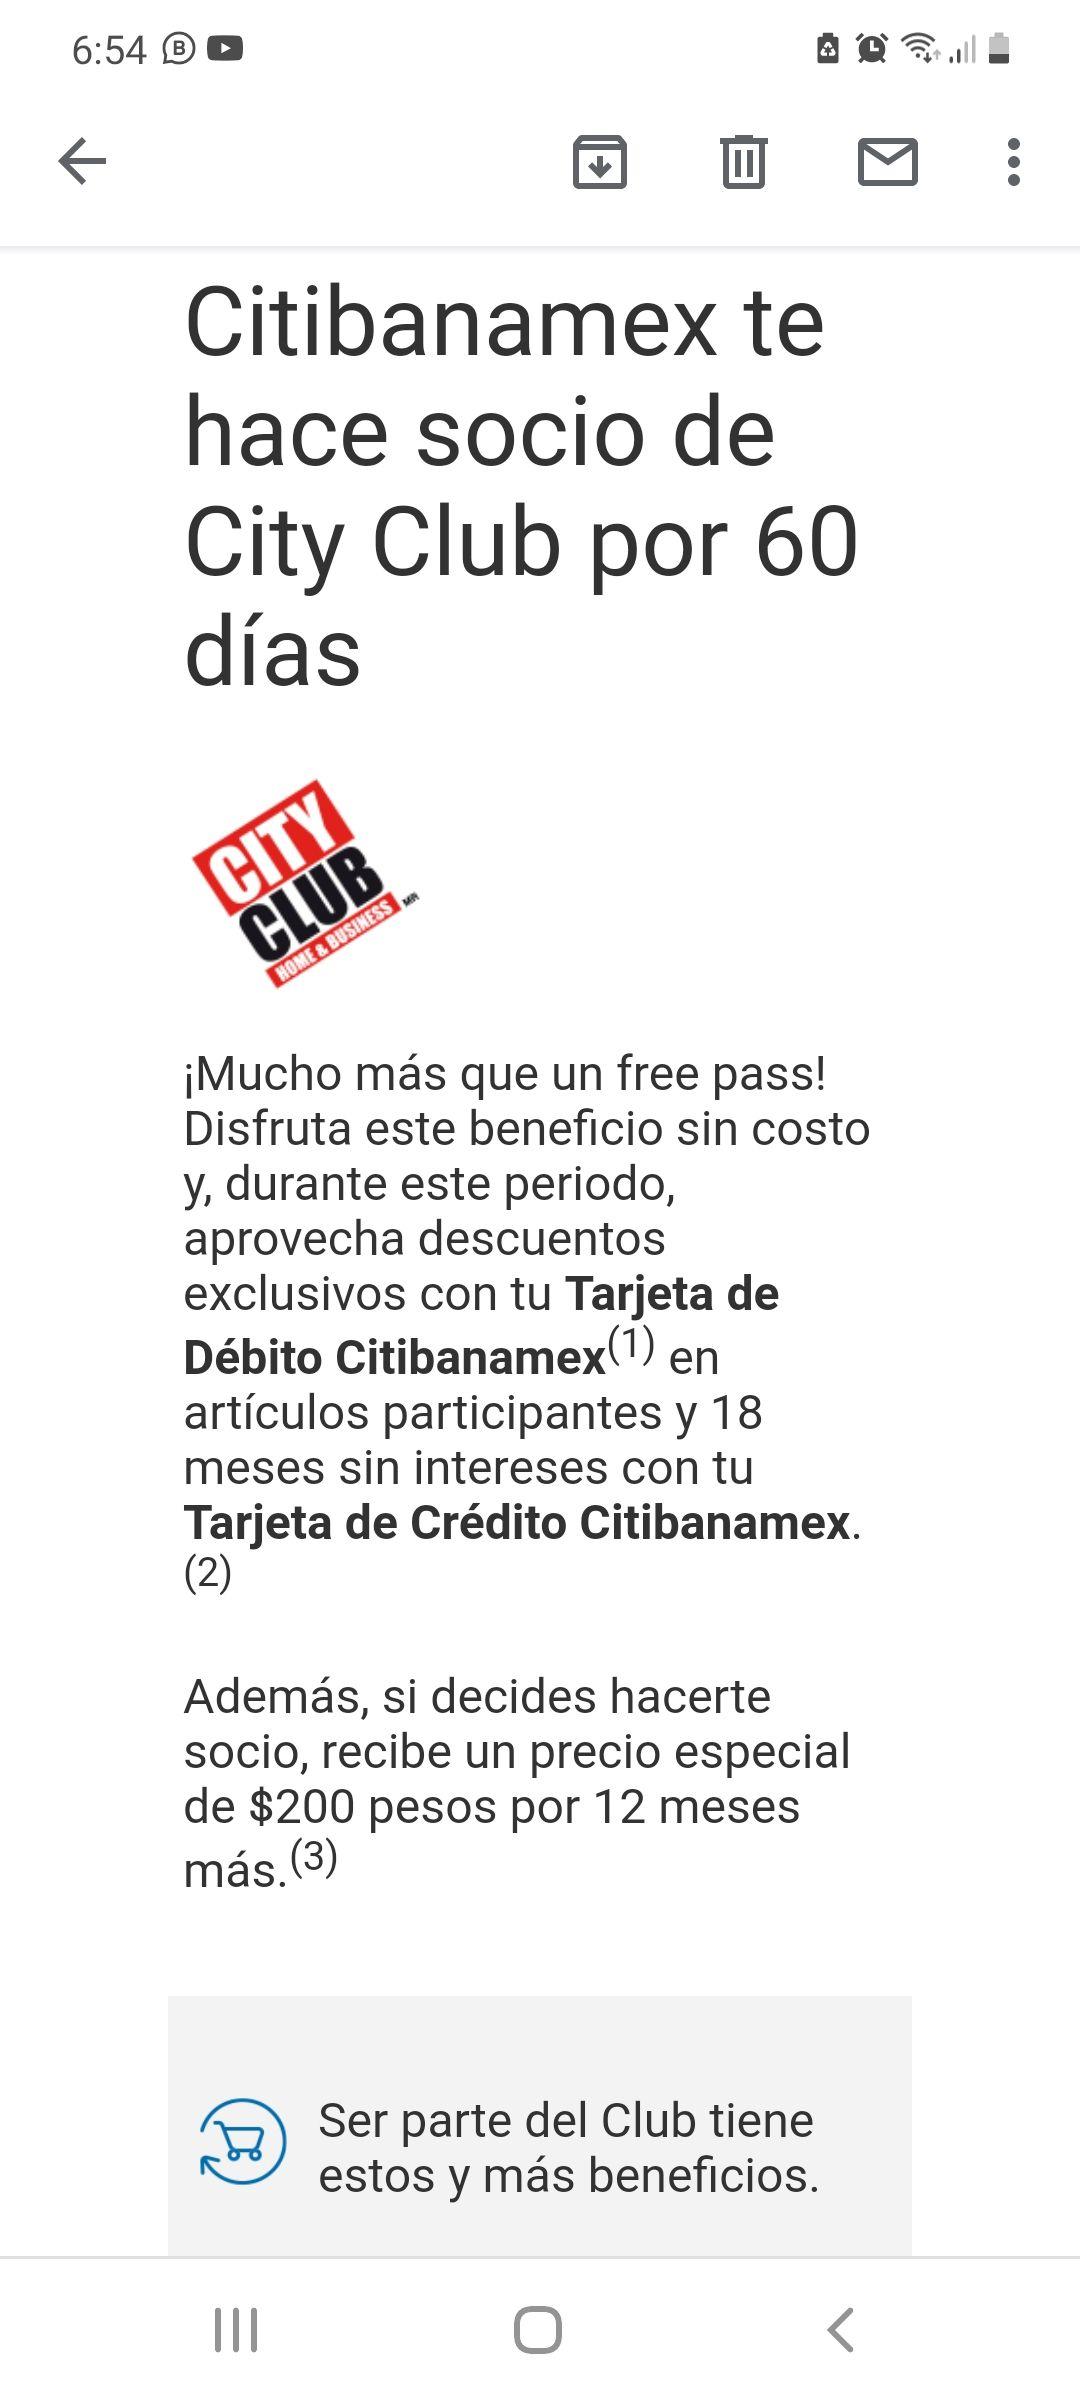 Citibanamex: Free Pass City Club por 60 días